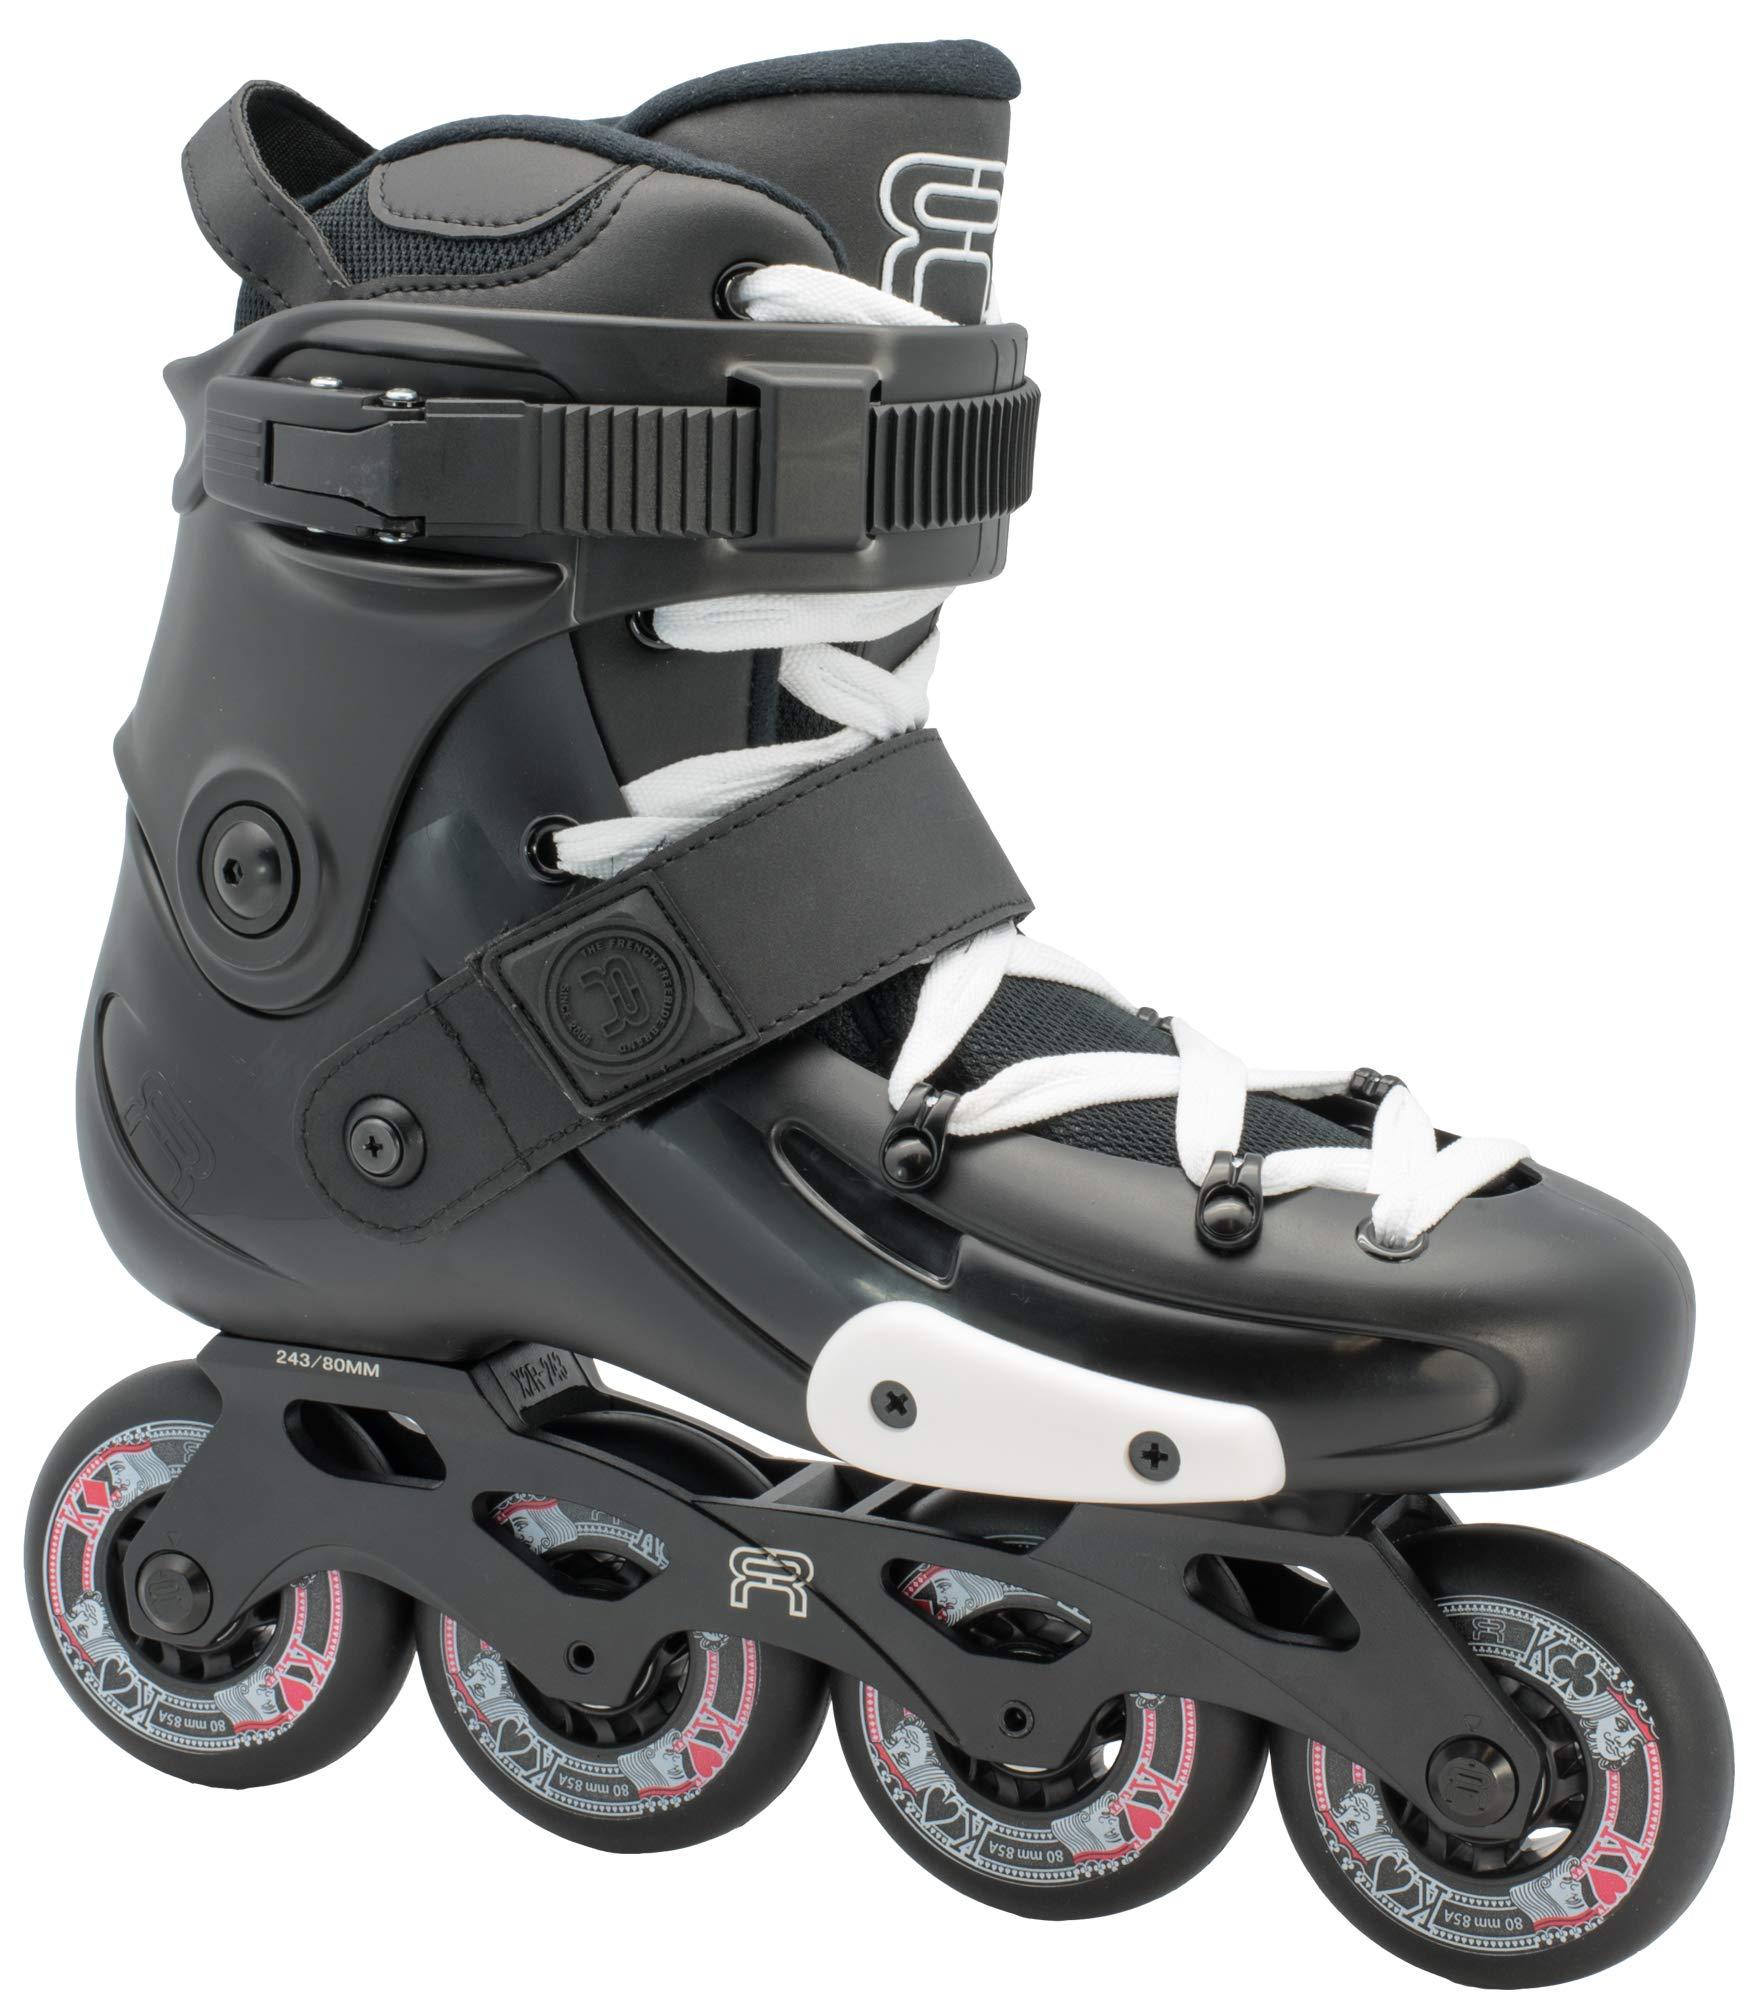 FR Skates FRX 80 2019 - Inline Skates for Freeride, Slalom, City Skating. Popular French Brand (M US 6 / EU38)